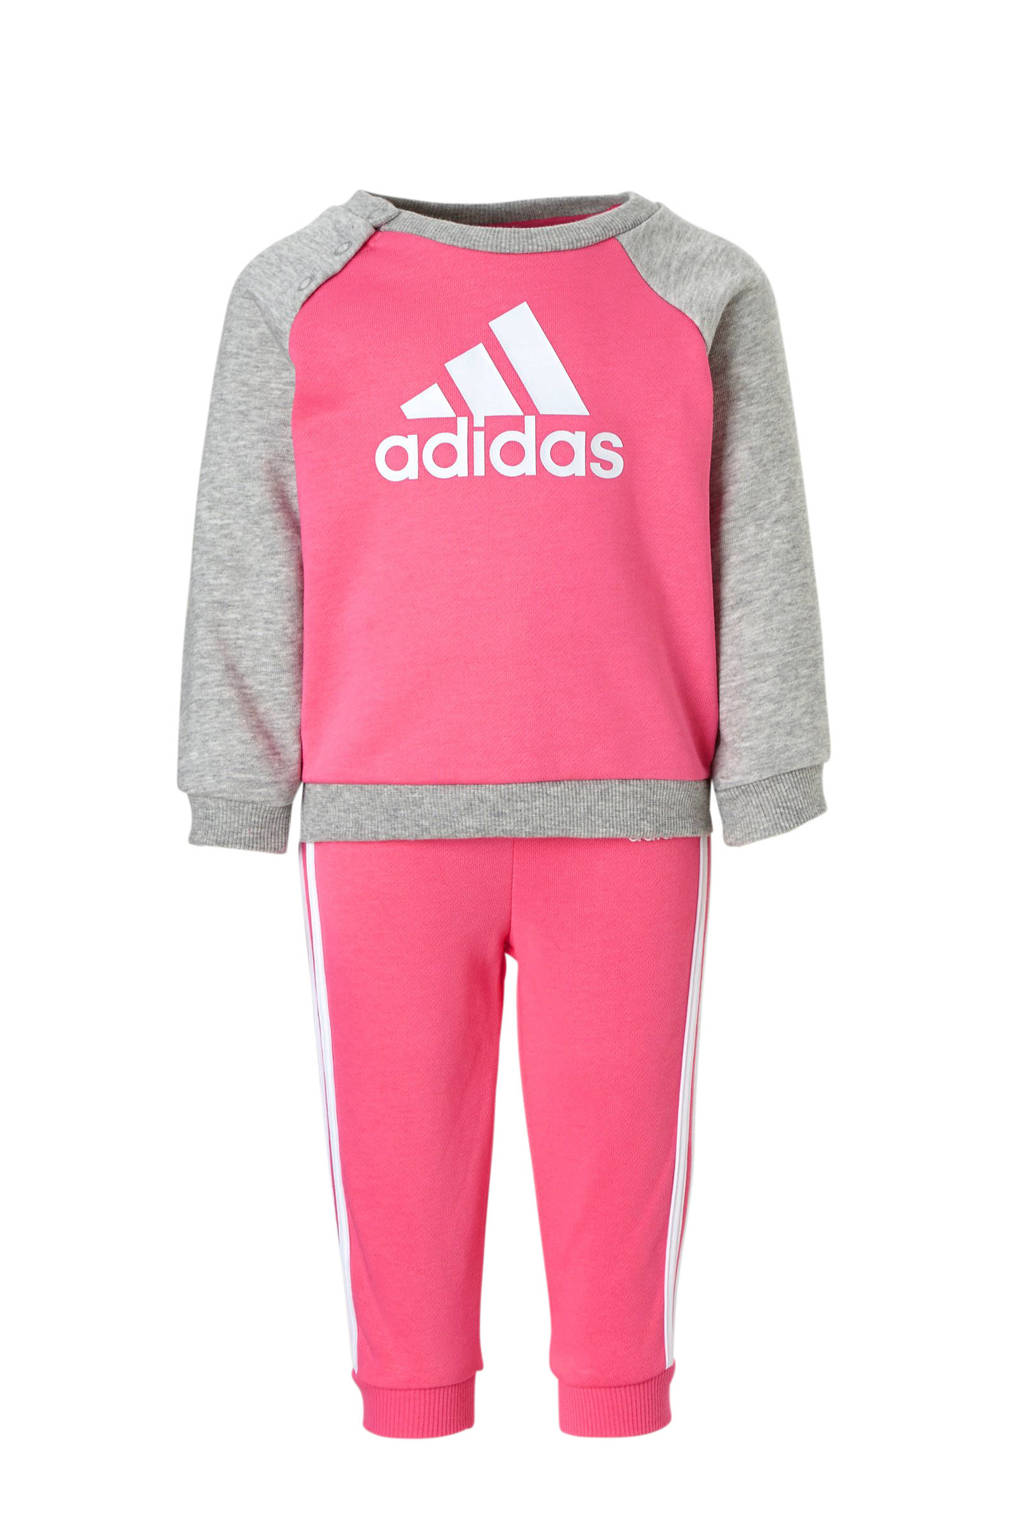 adidas performance trainingspak roze/grijs, Roze/grijs